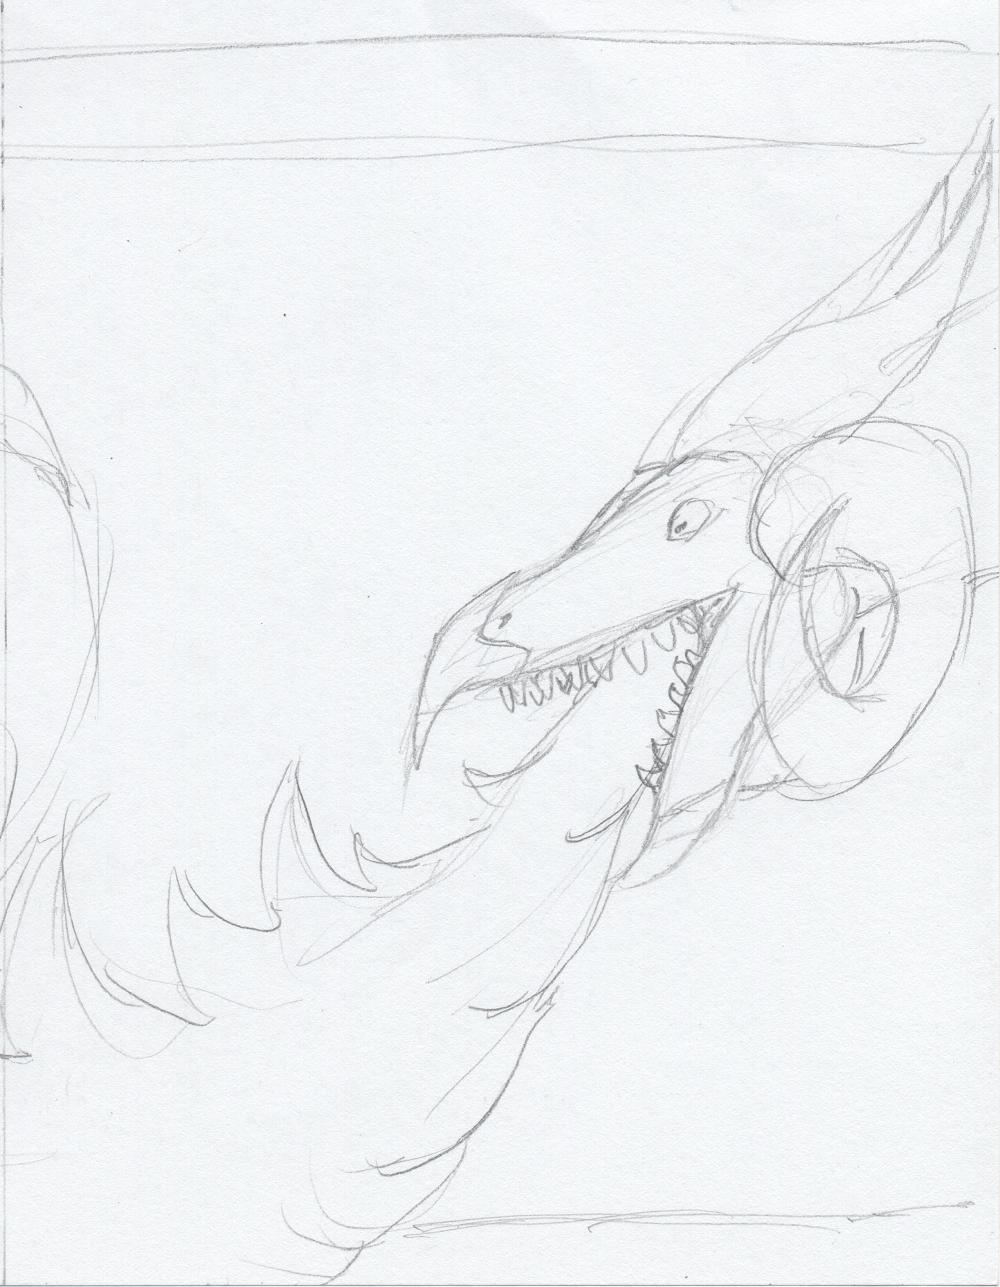 Intermission Sketch